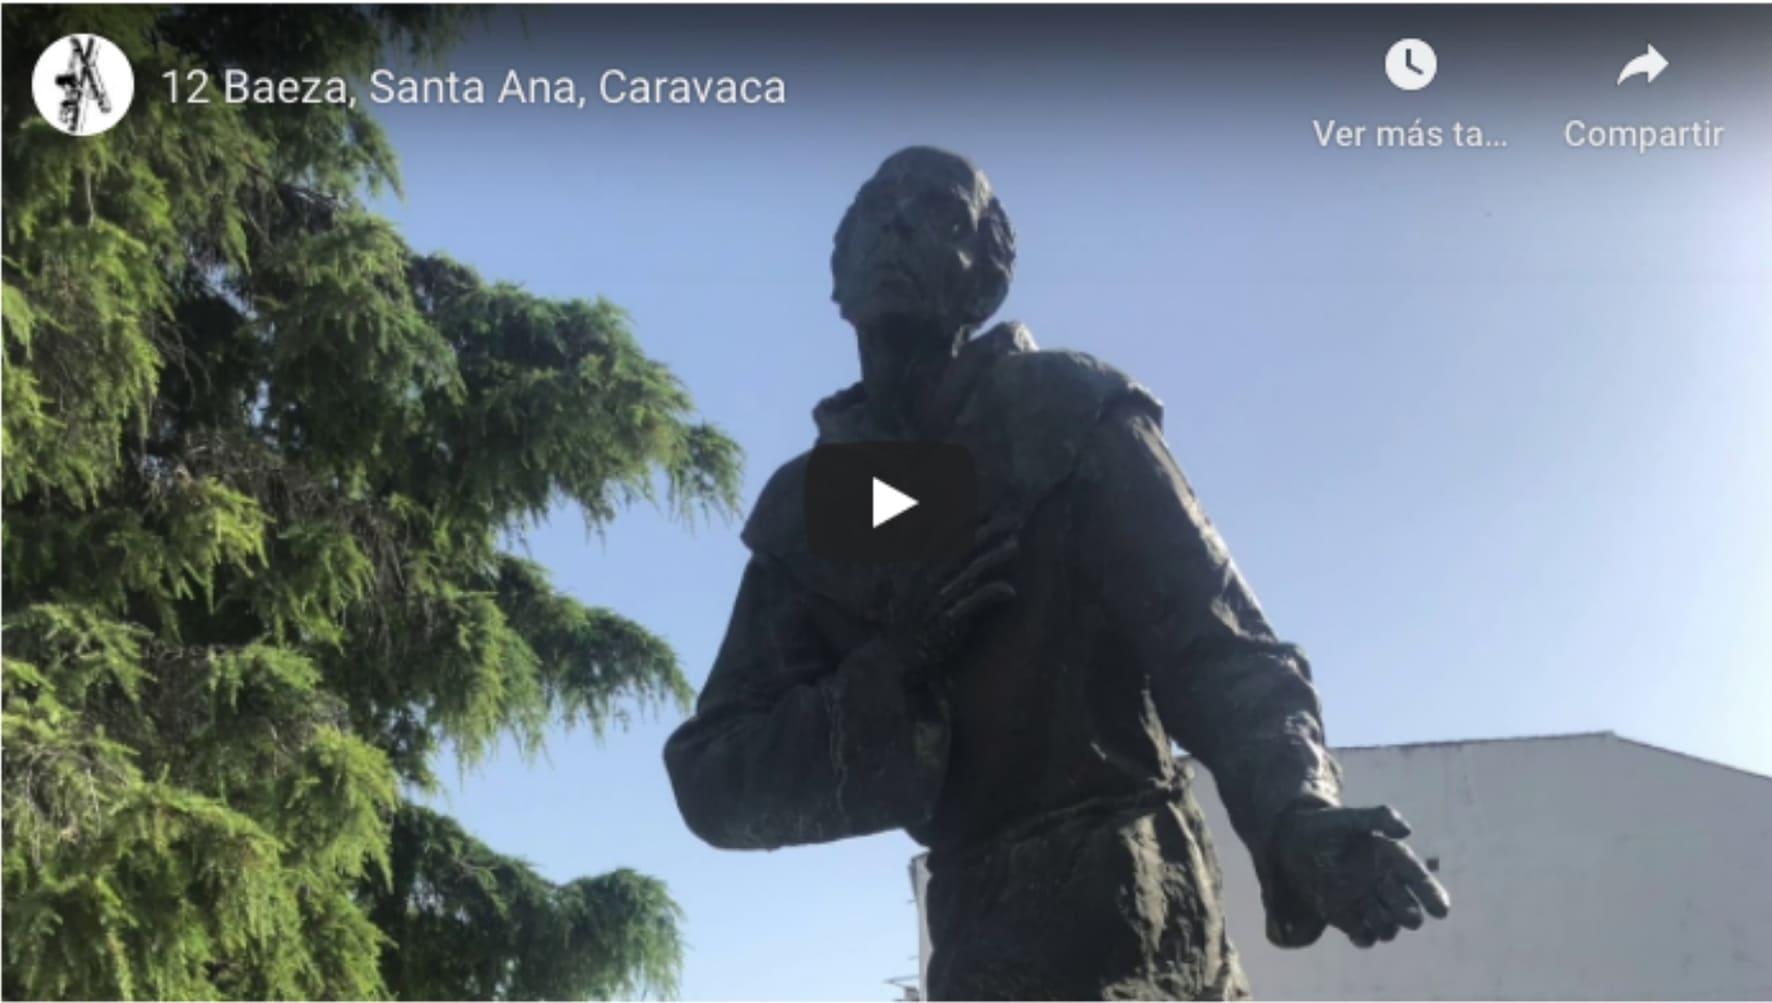 12. Baeza   Santa Ana   Caravaca